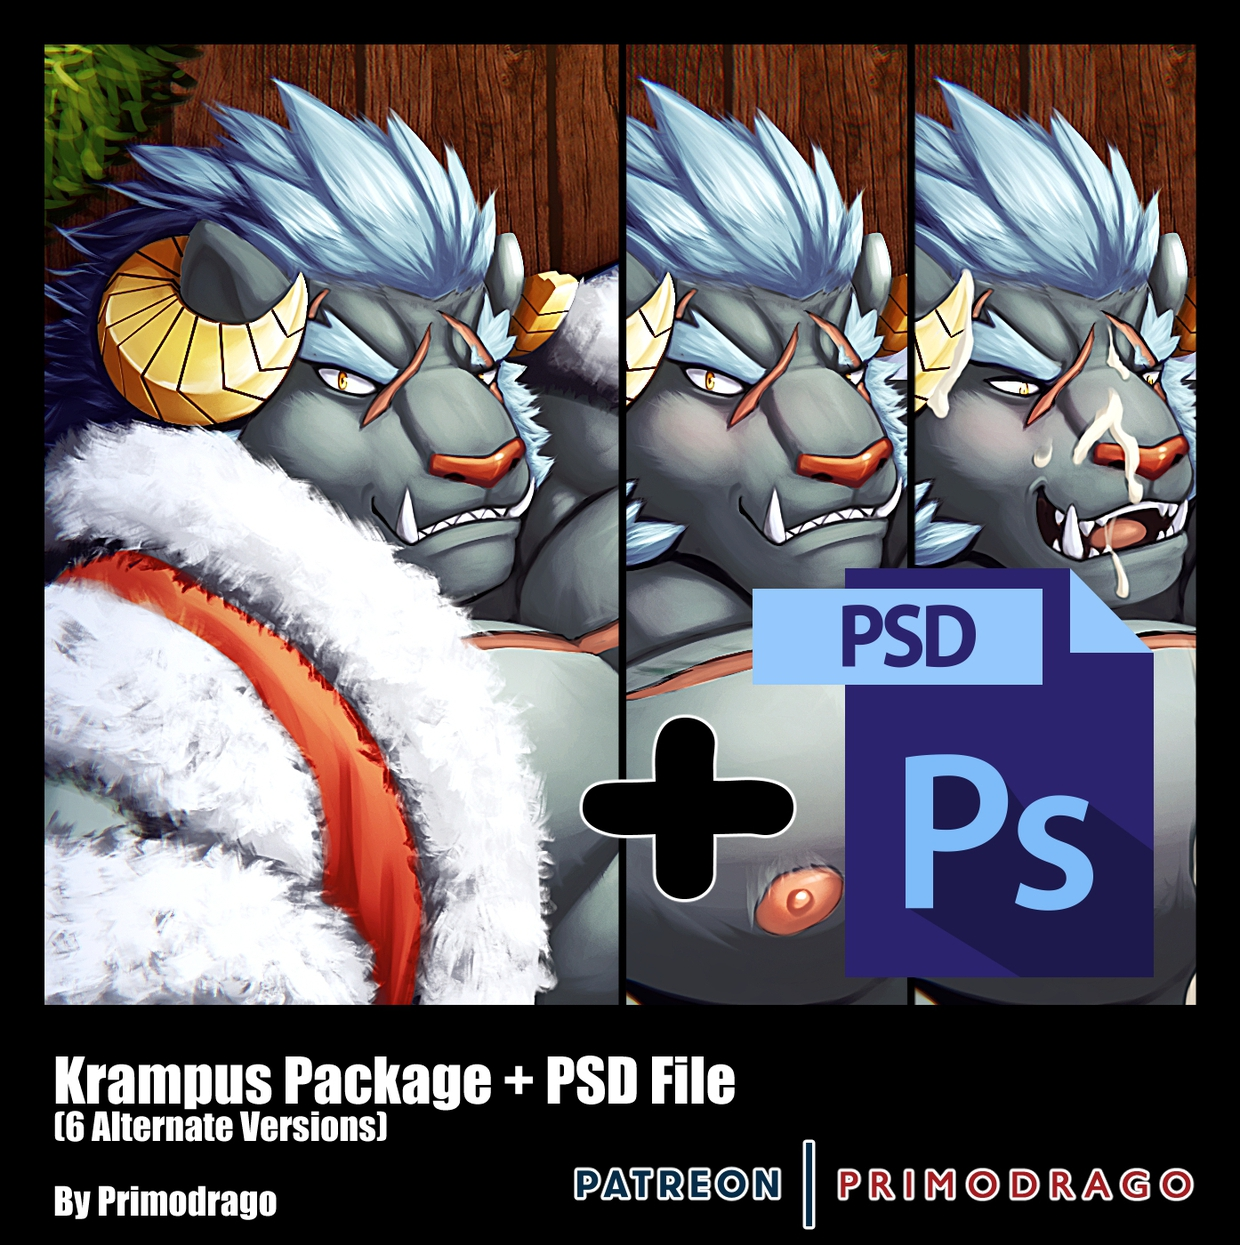 Krampus Artpack + PSD File